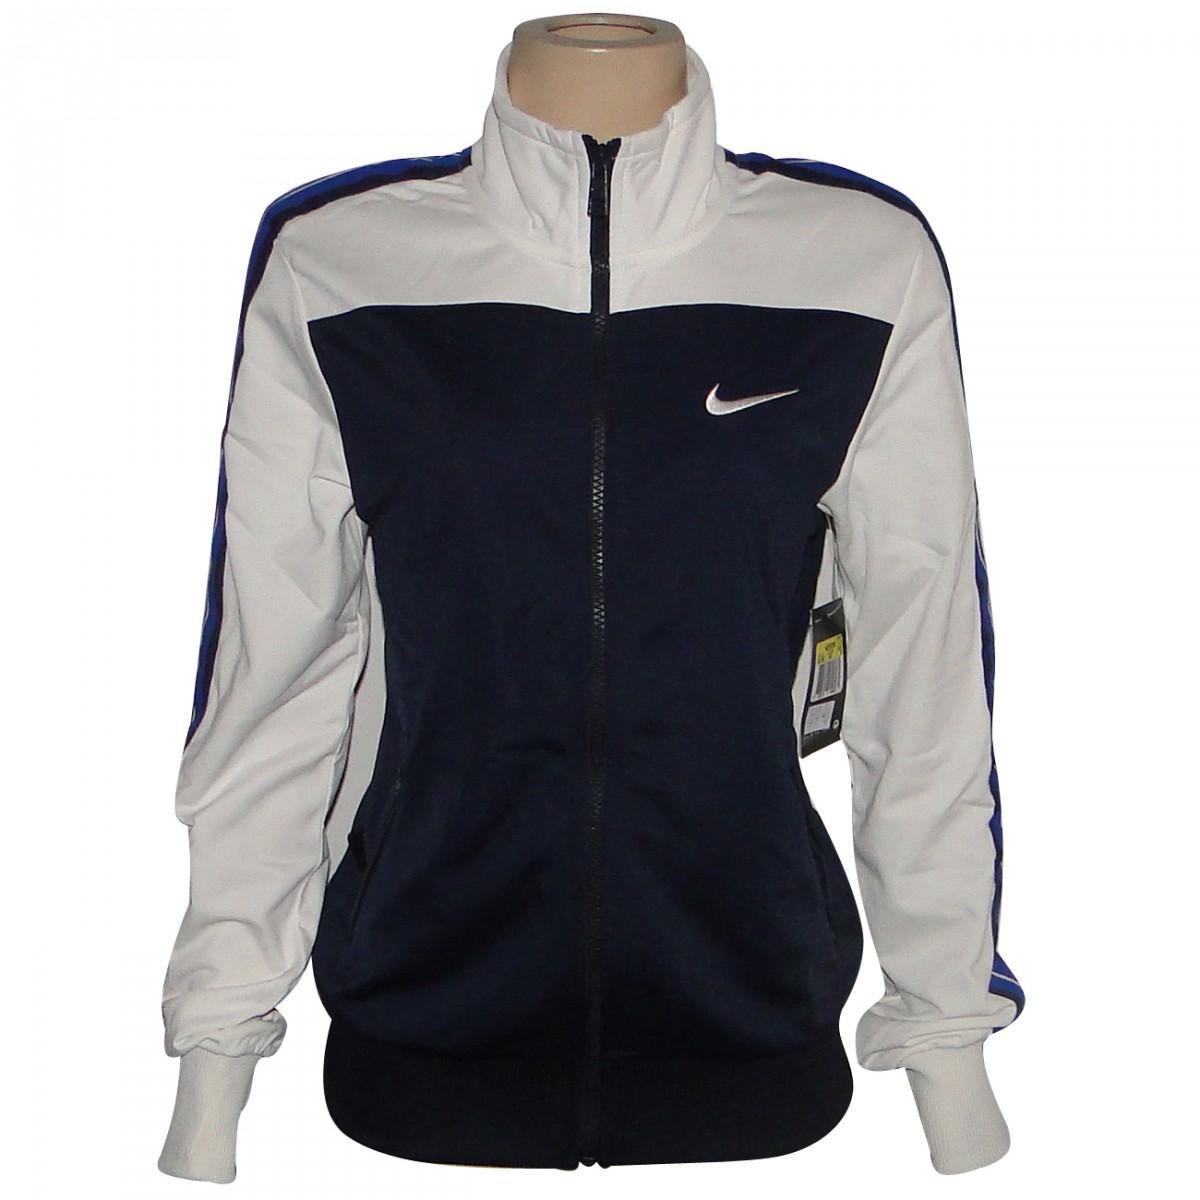 76d128a36d56b Agasalho Nike 521887 521887-451 - Gelo Azul - Chuteira Nike